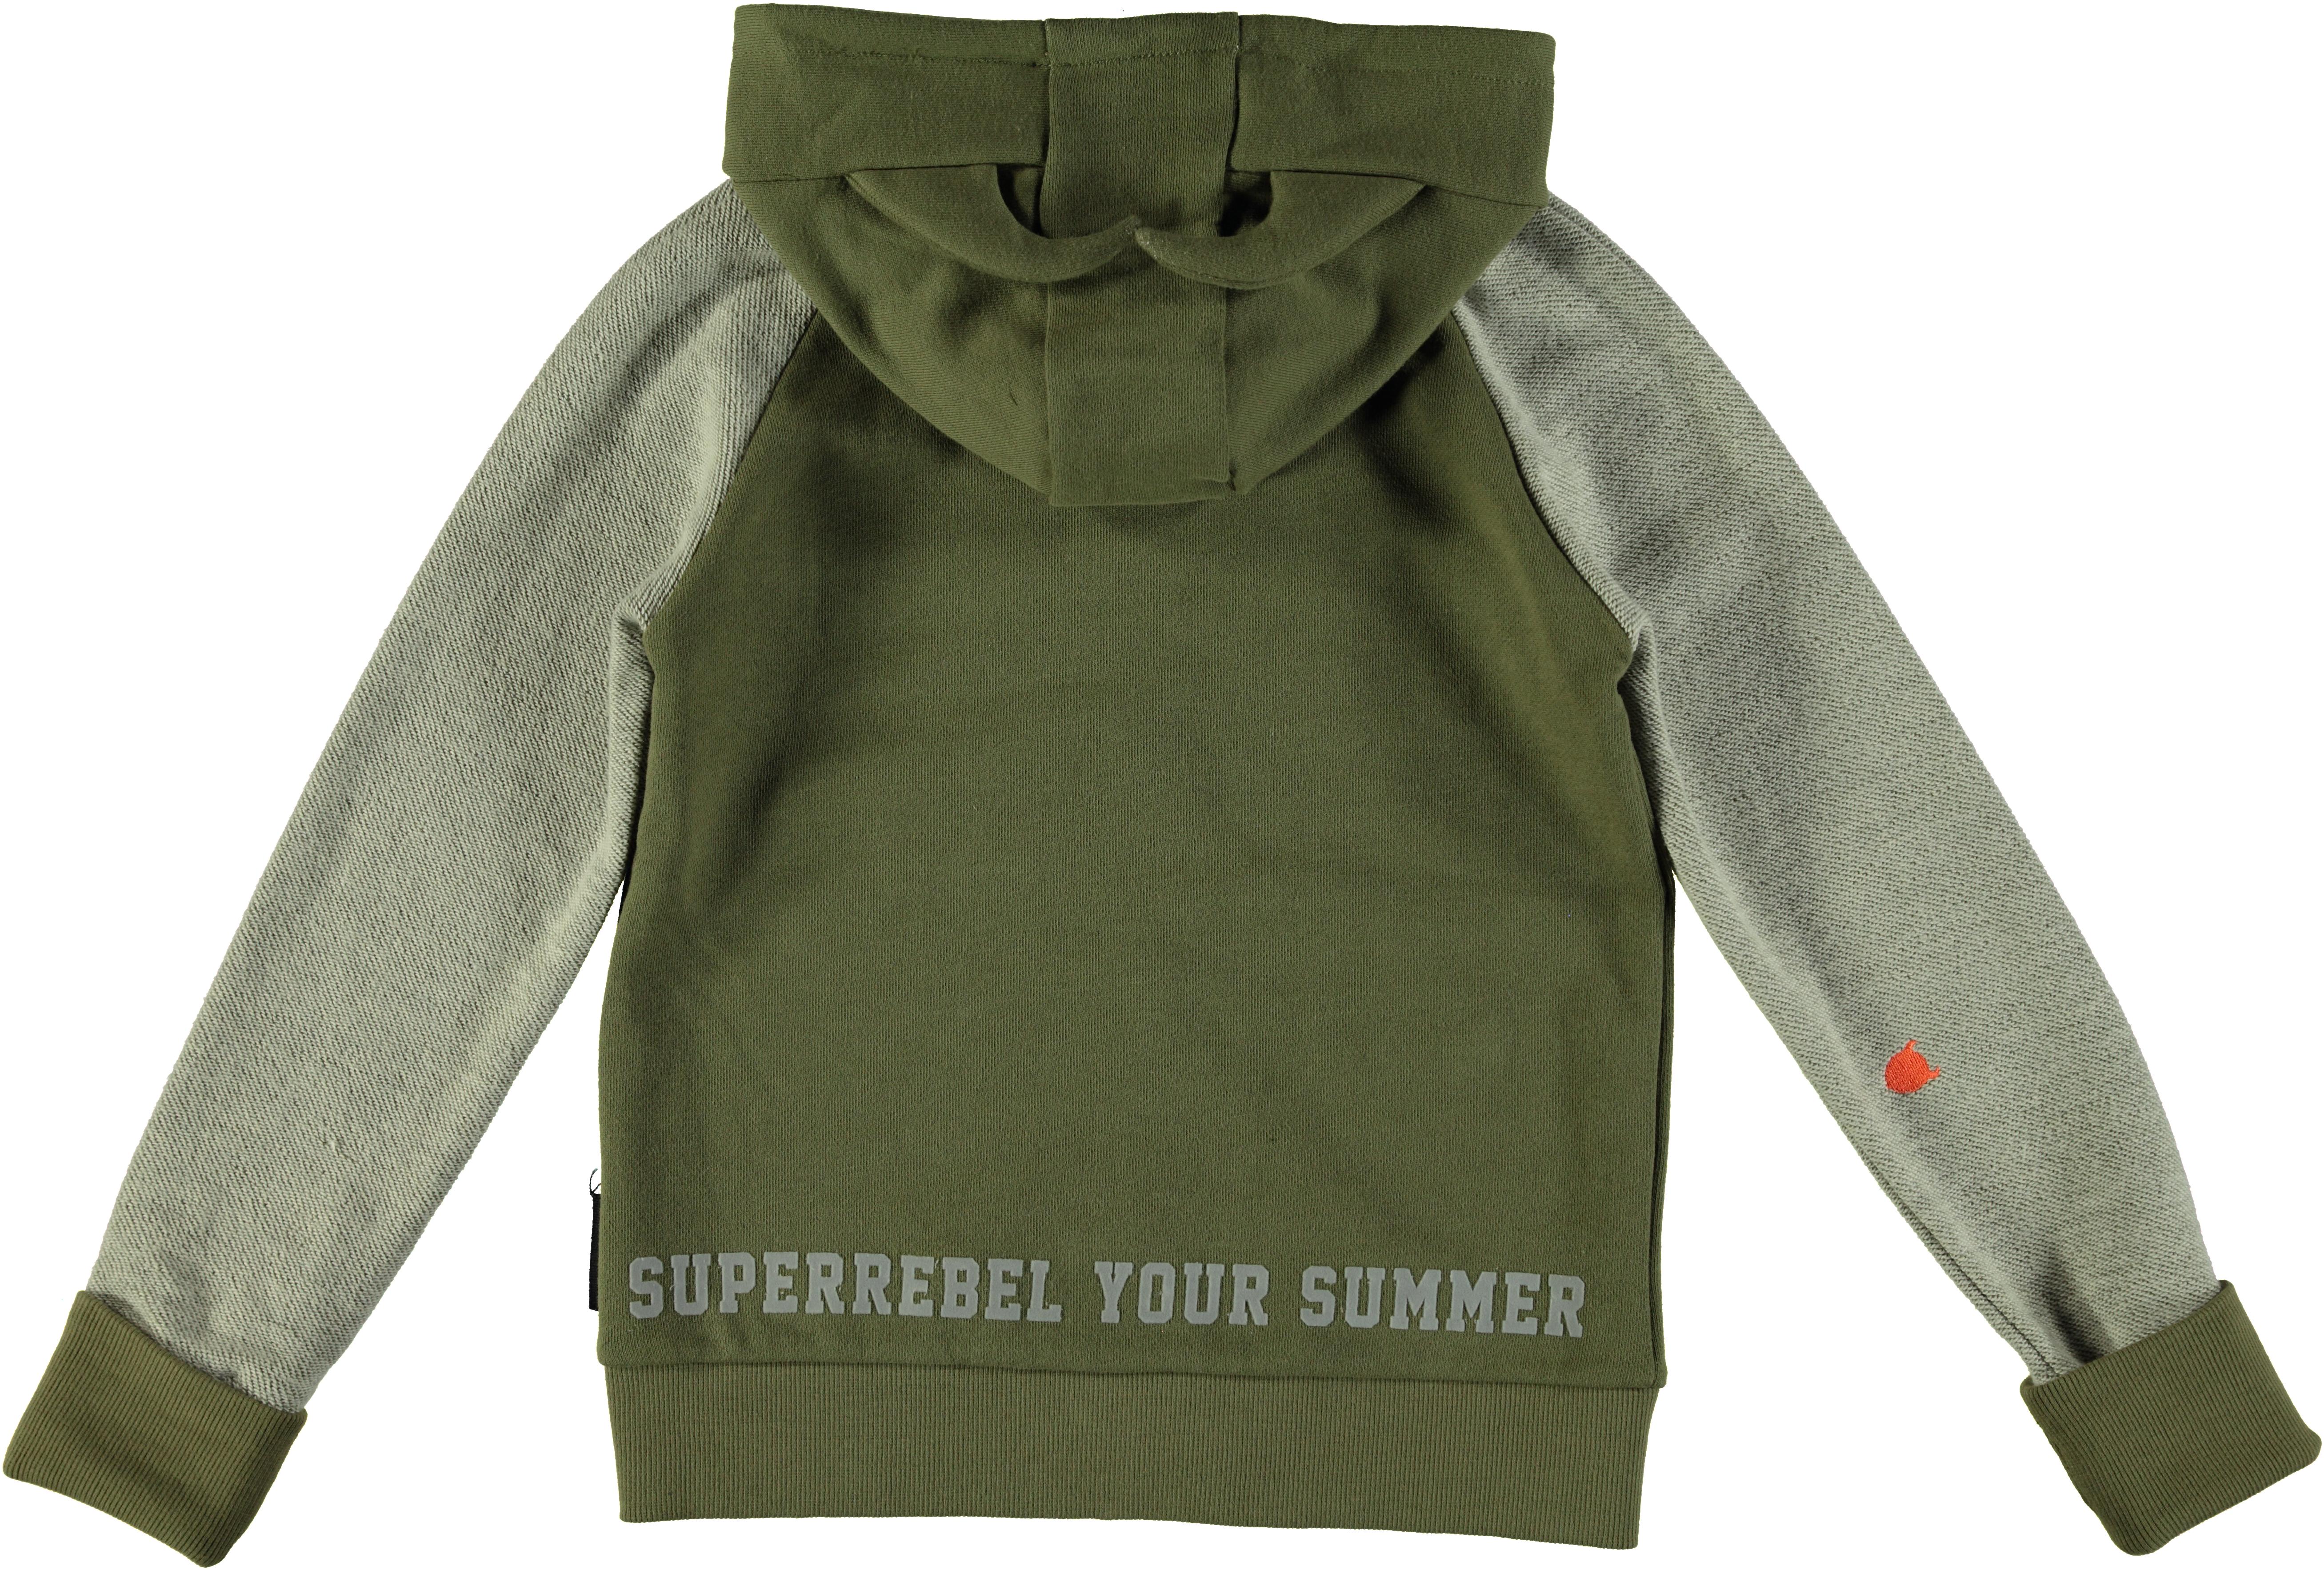 188202 superrebel kidsgear hoodie olive %e2%82%ac69,95 back 92584b original 1448370781